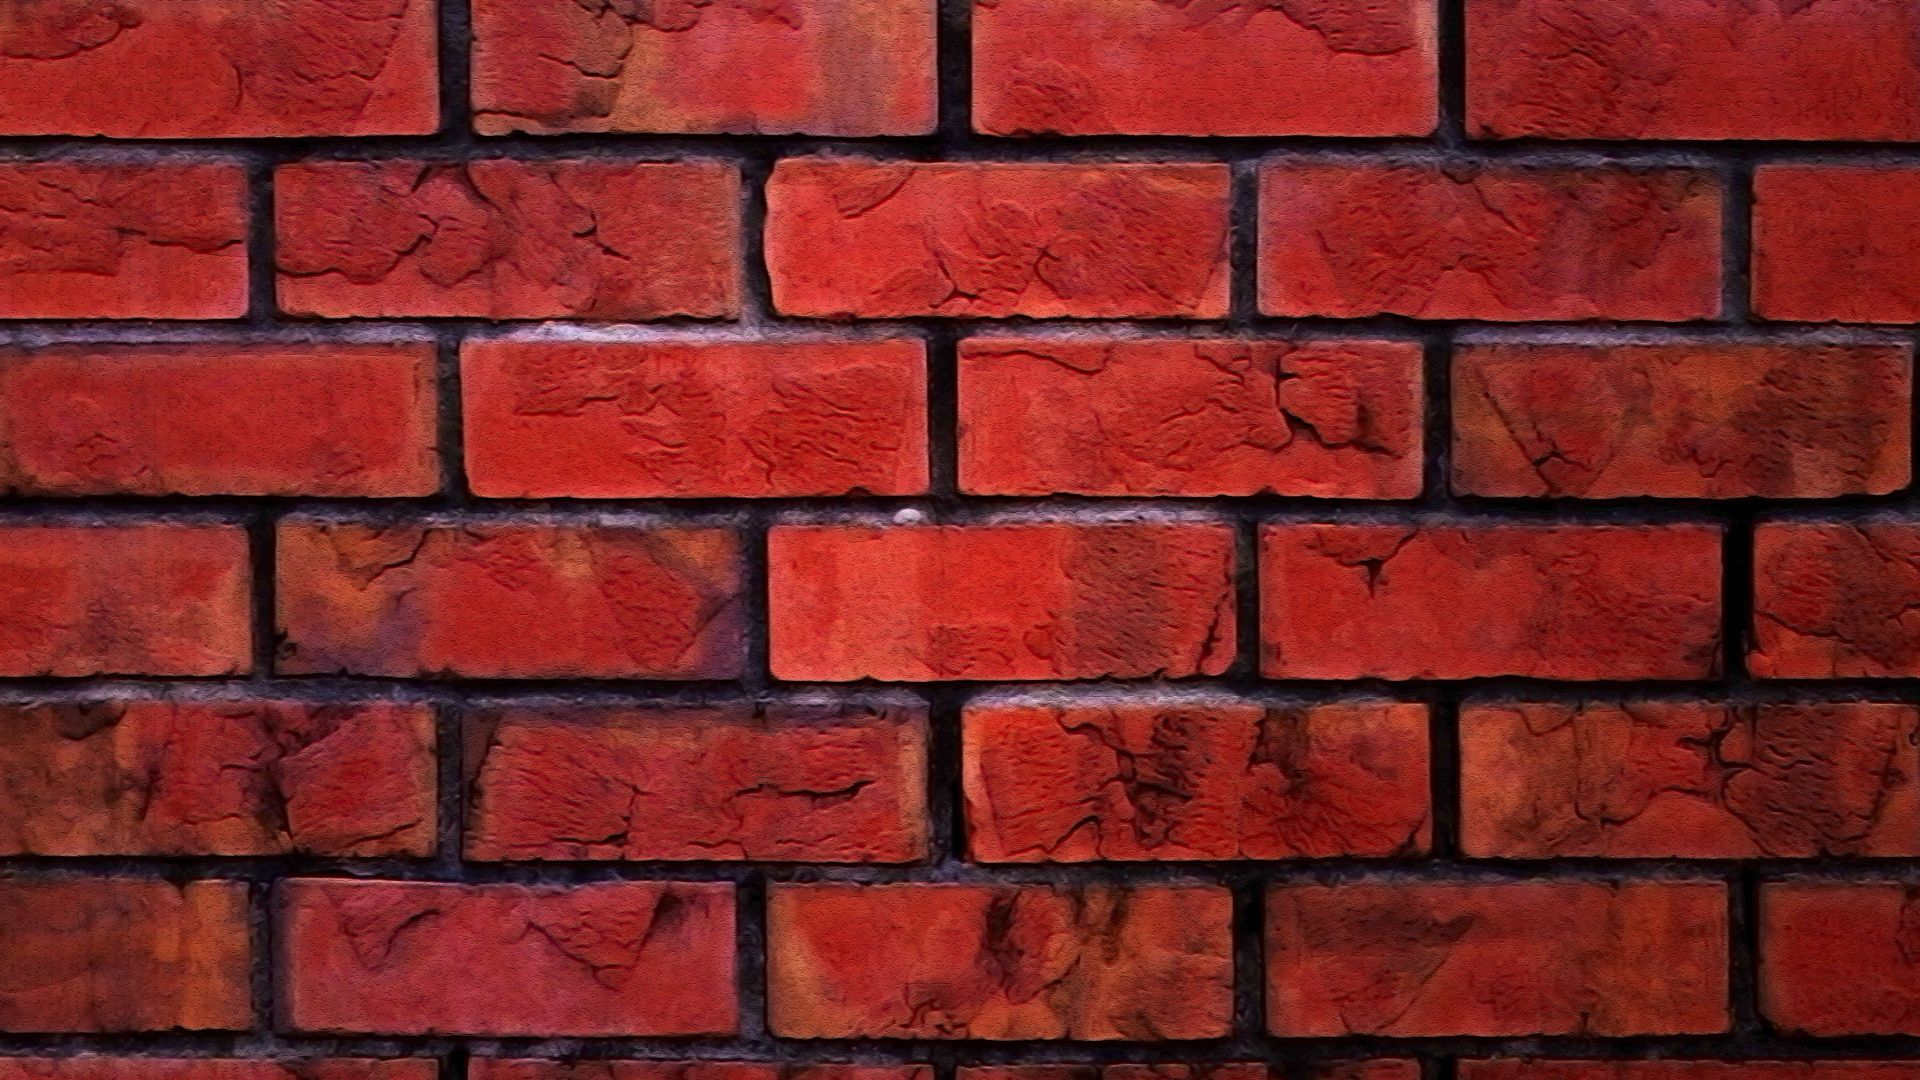 Brick Paper Backdrop Wallpaper Image